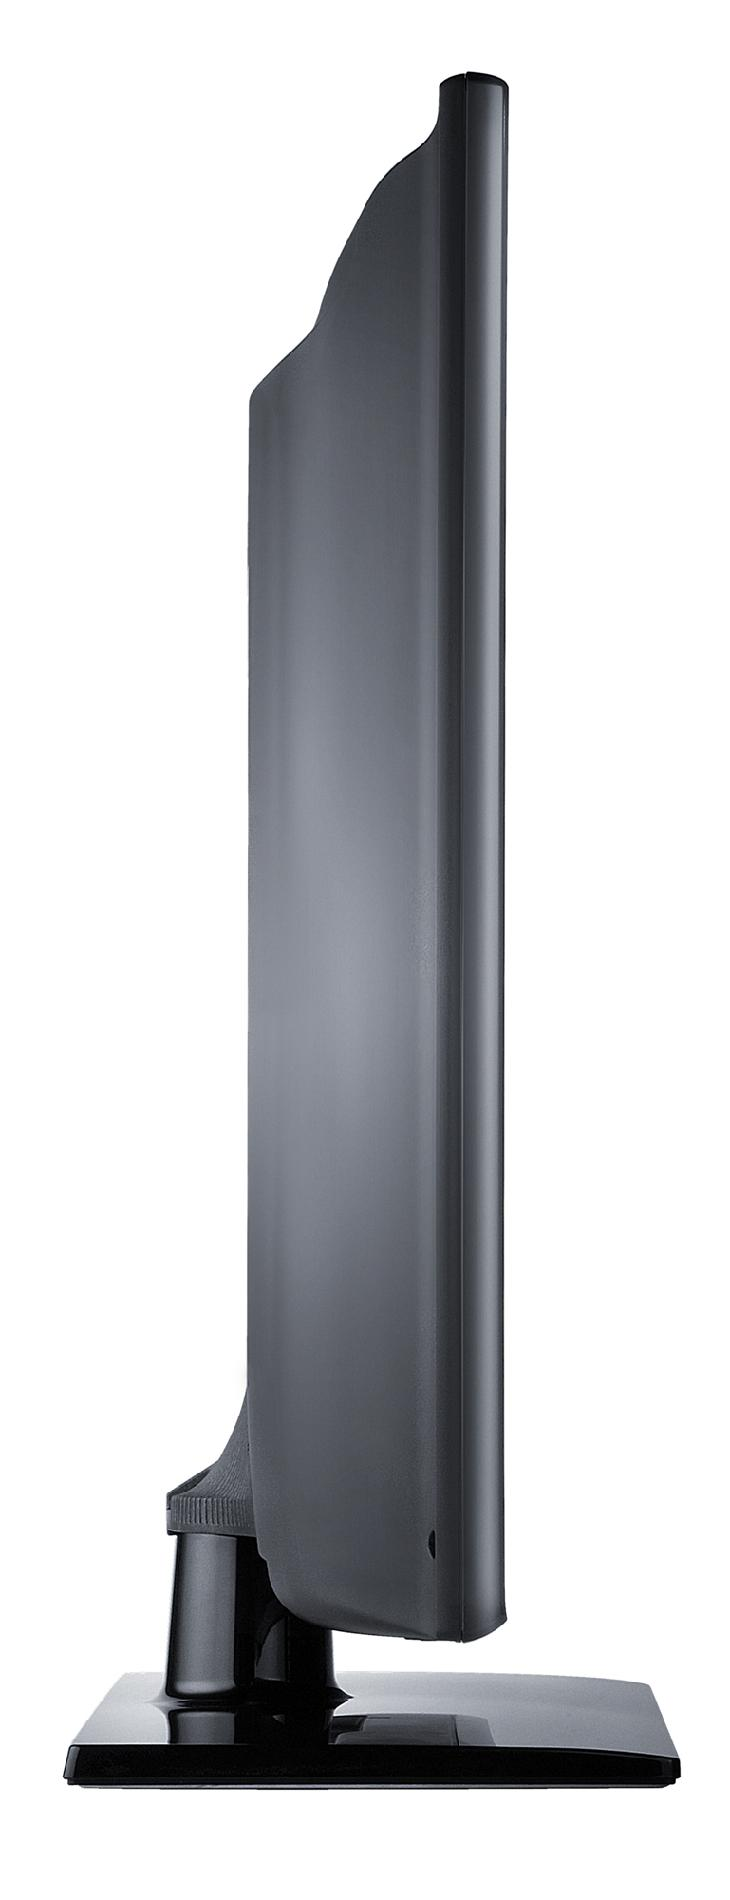 "Samsung 46"" Class 1080p 120Hz 3D LED HDTV - UN46FH6030FXZA"